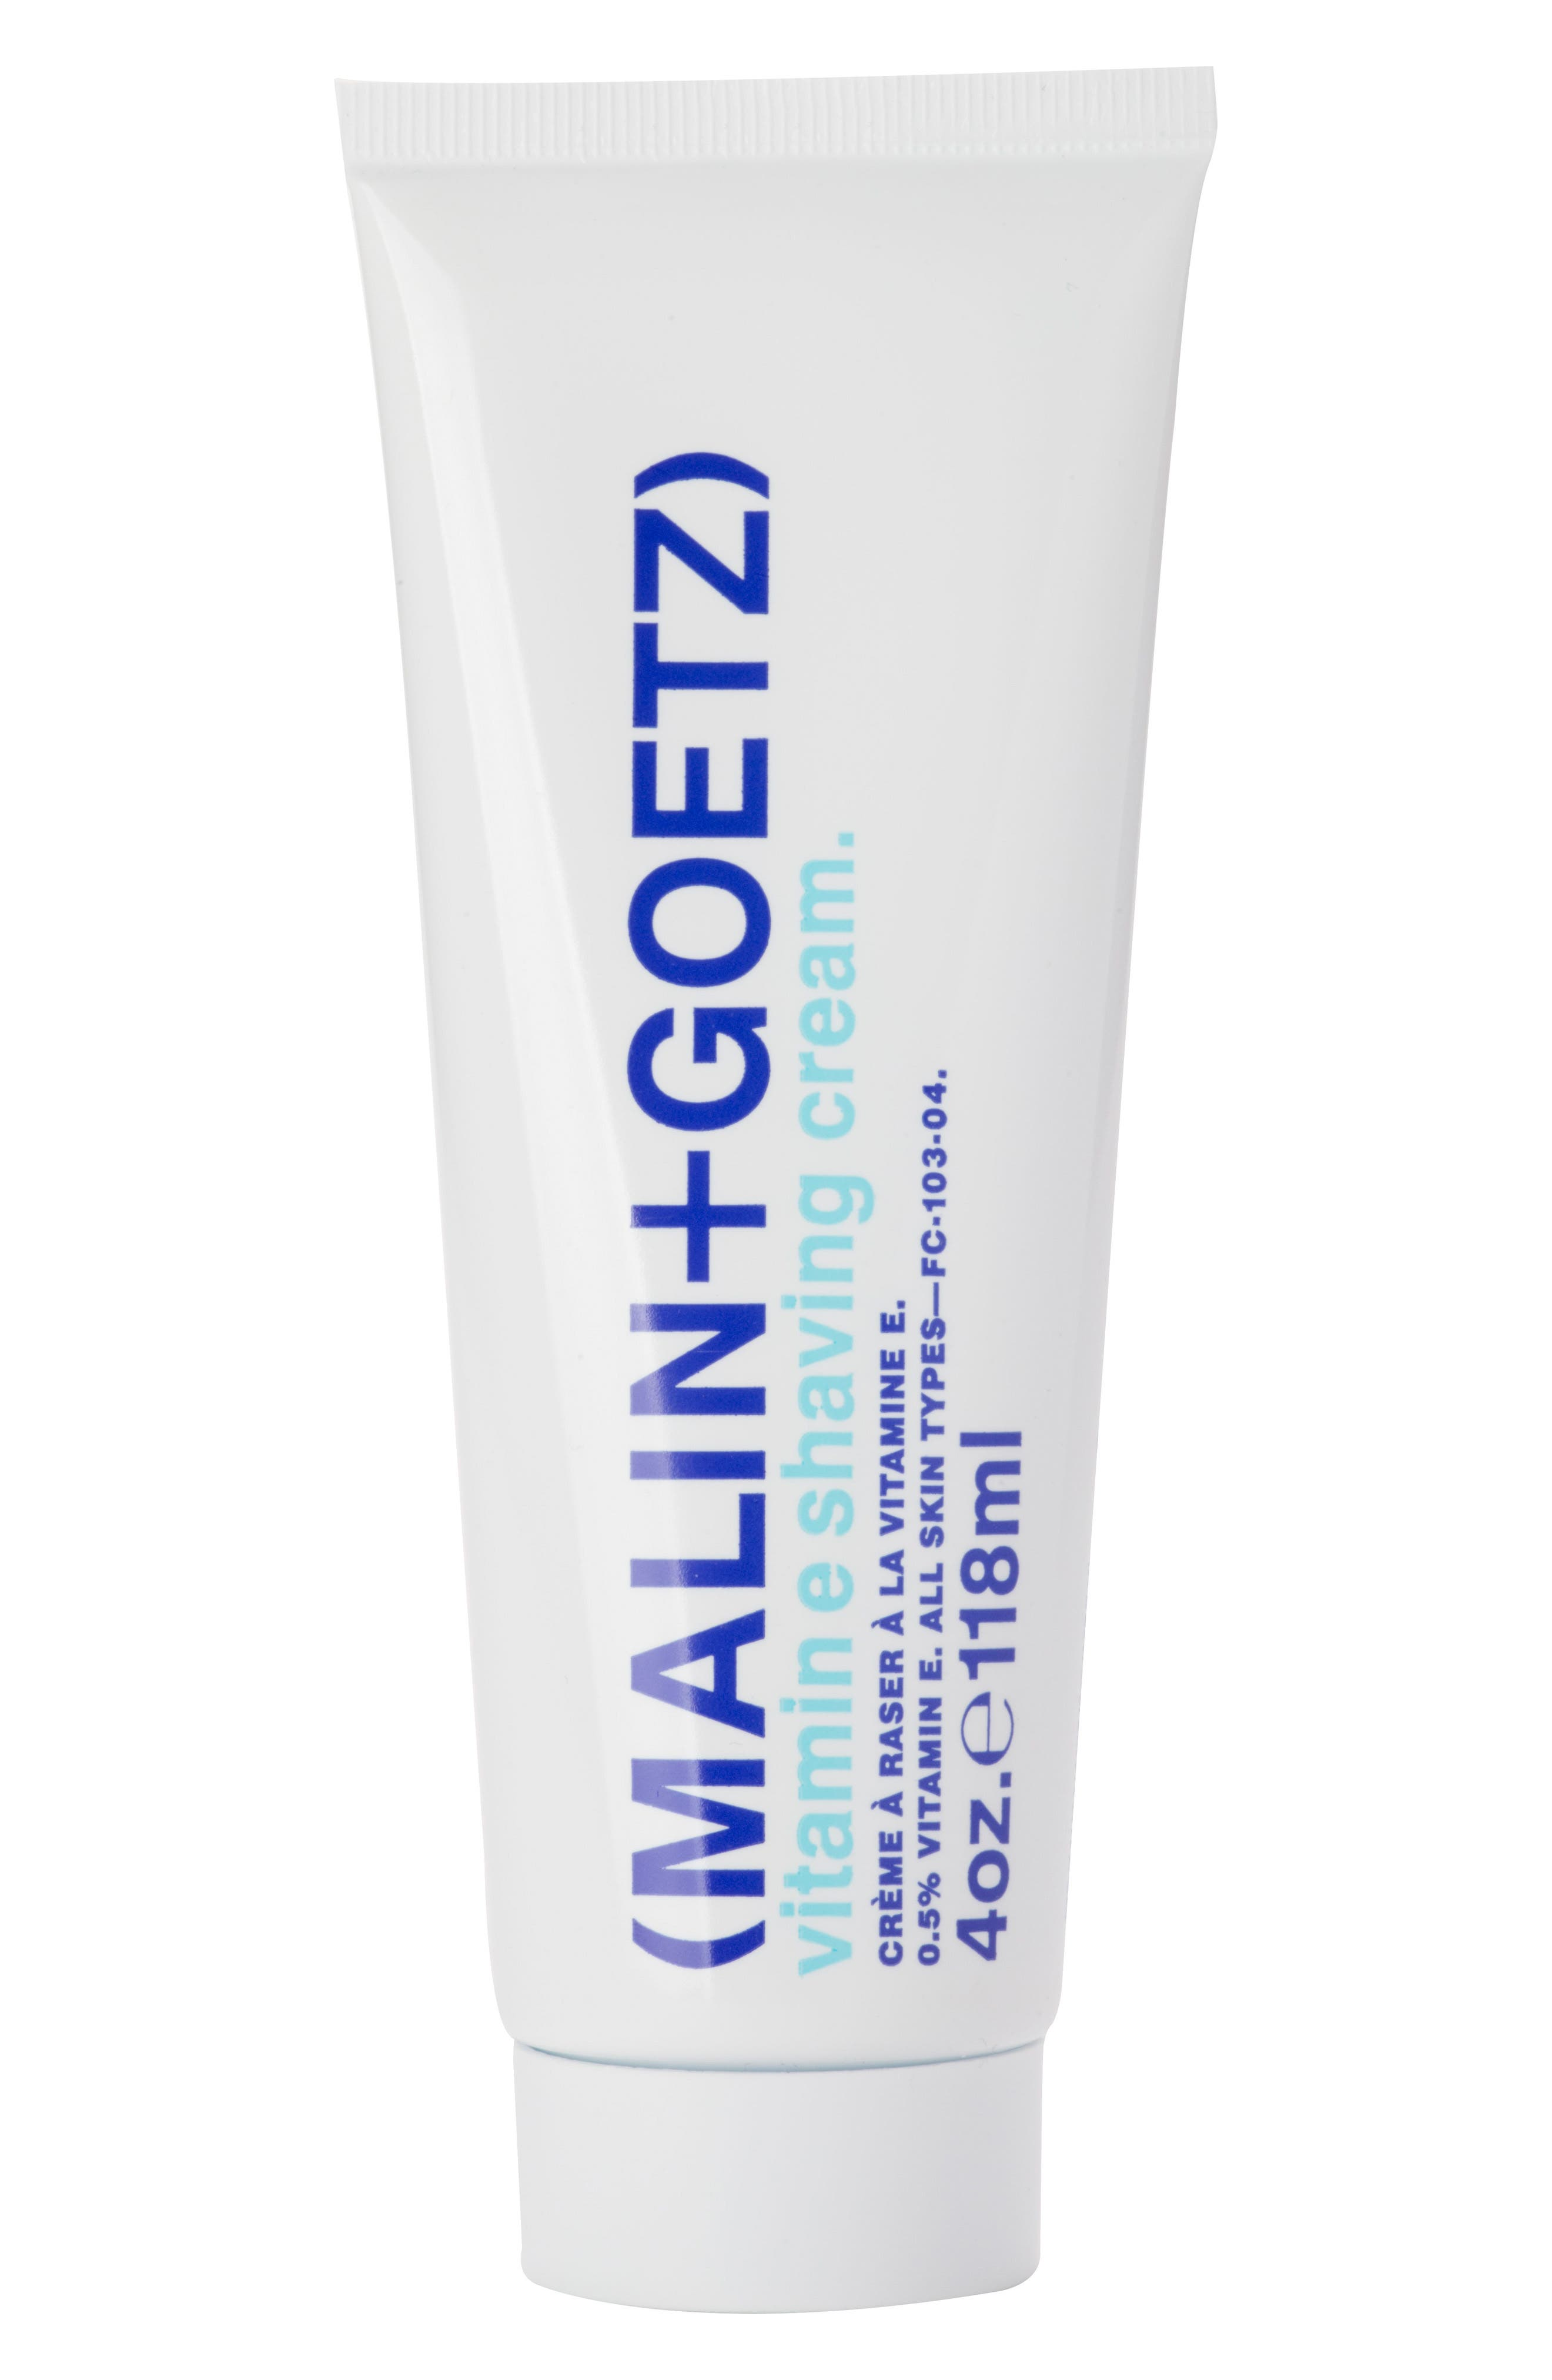 Vitamin E Shaving Cream,                             Main thumbnail 1, color,                             NO COLOR